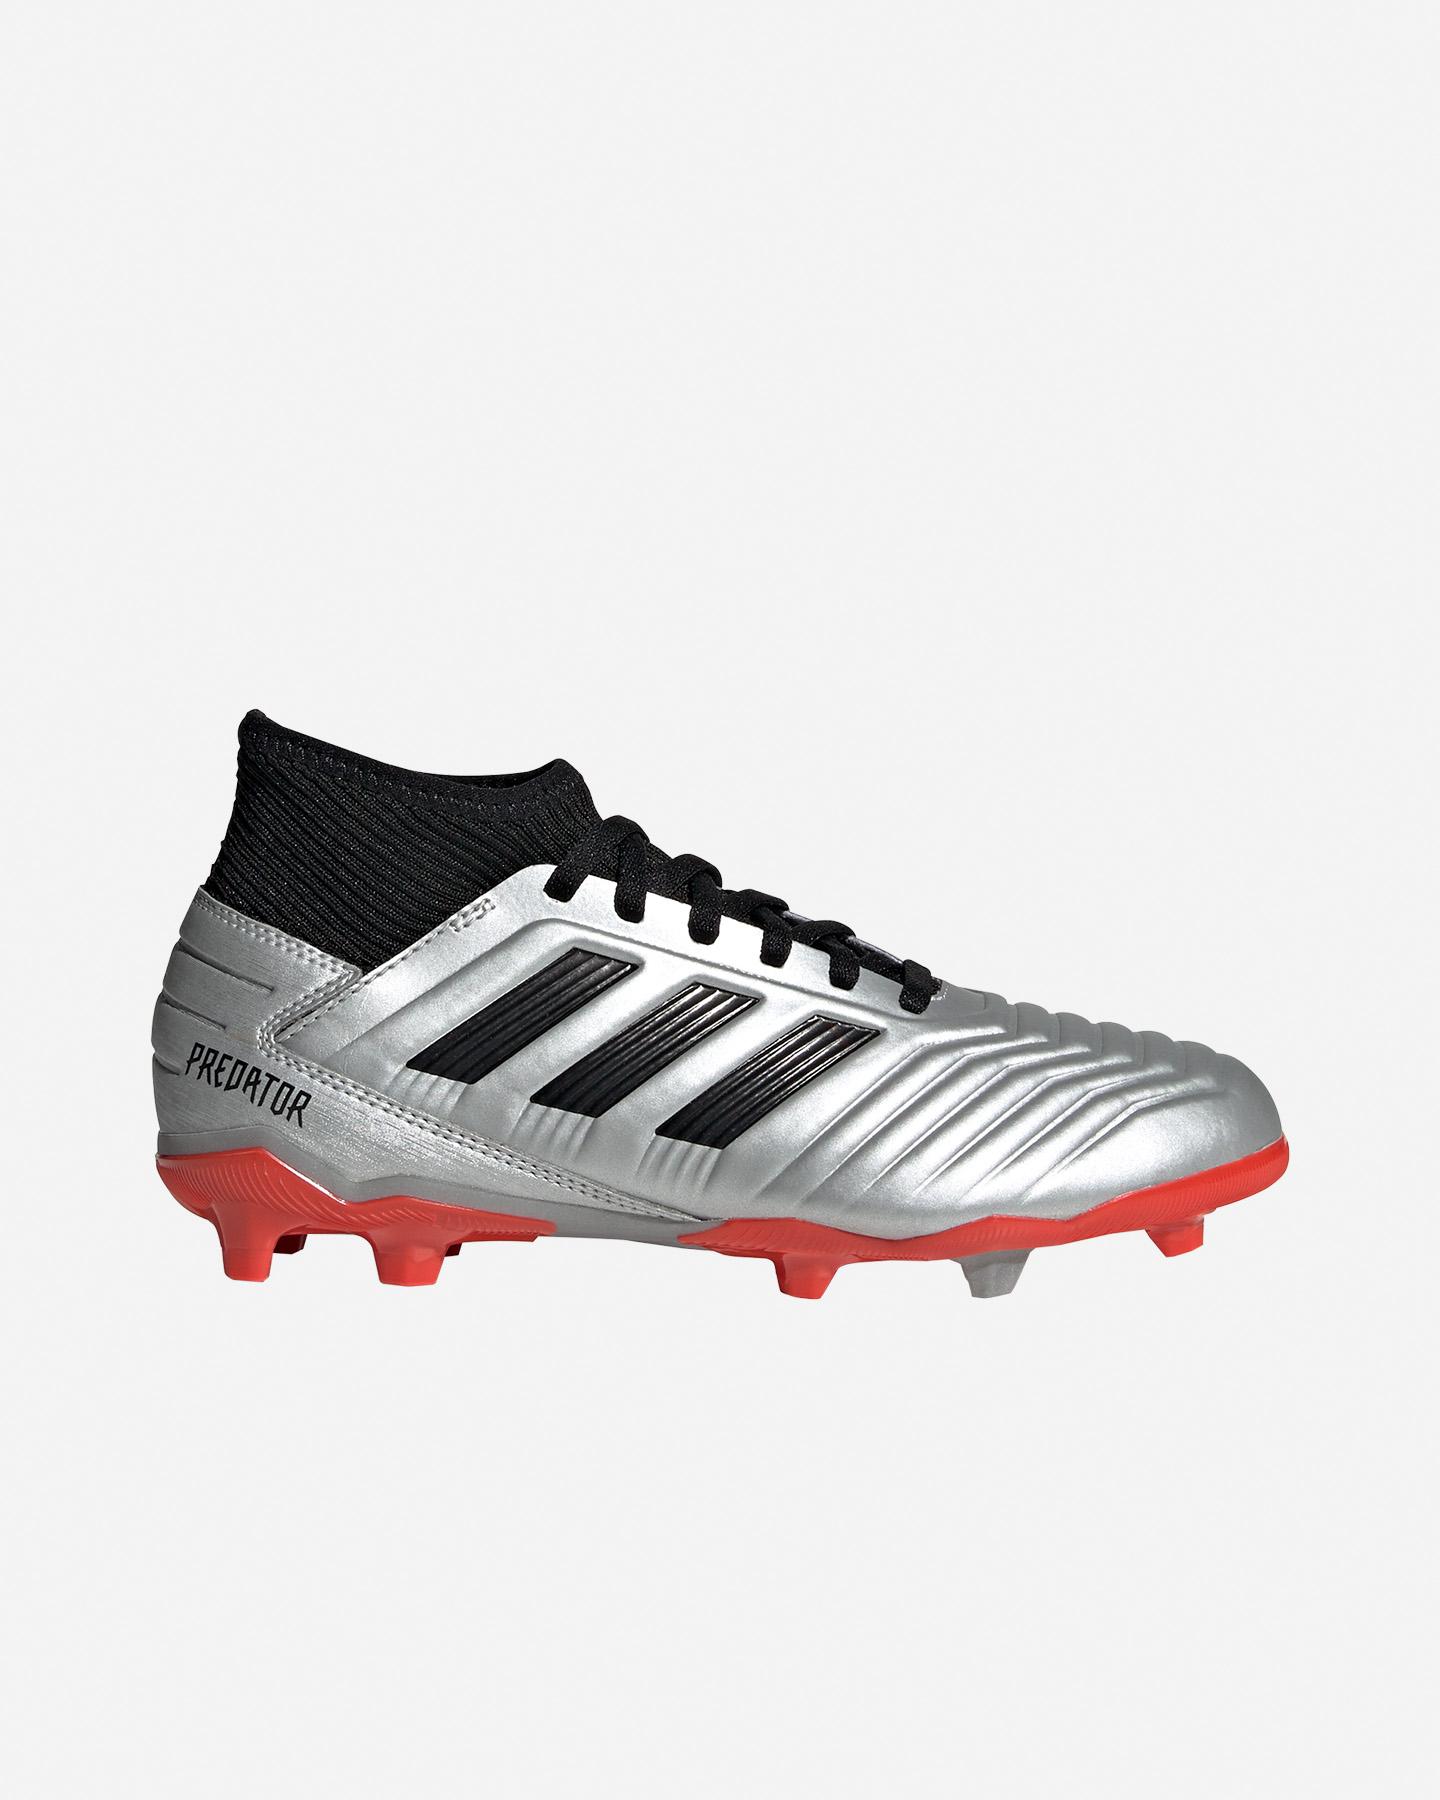 adidas scarpe calcio taglie